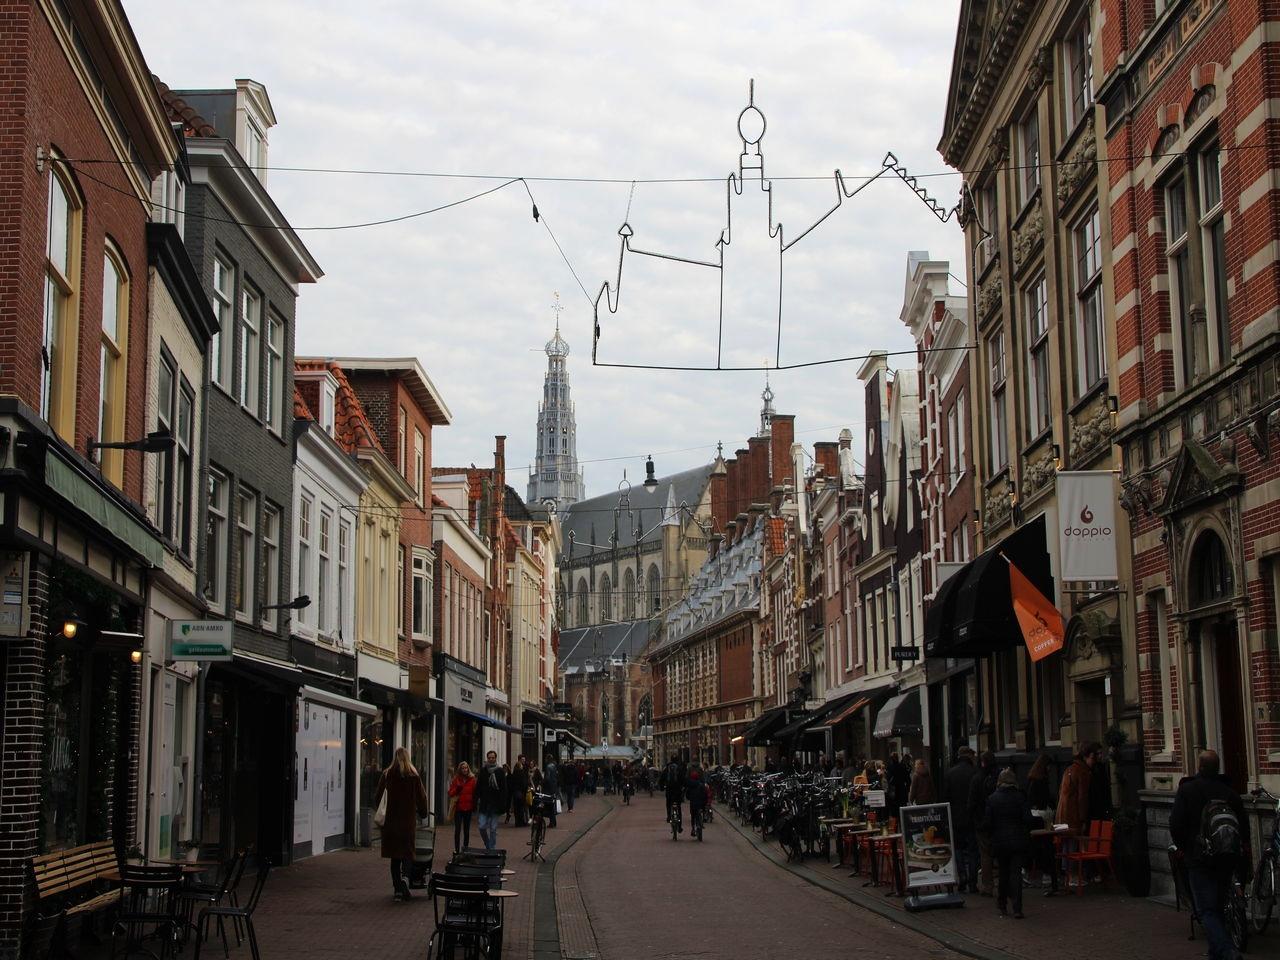 Calle Zijlstraat, cerca del Ayuntamiento de Haarlem o Stadhuis.